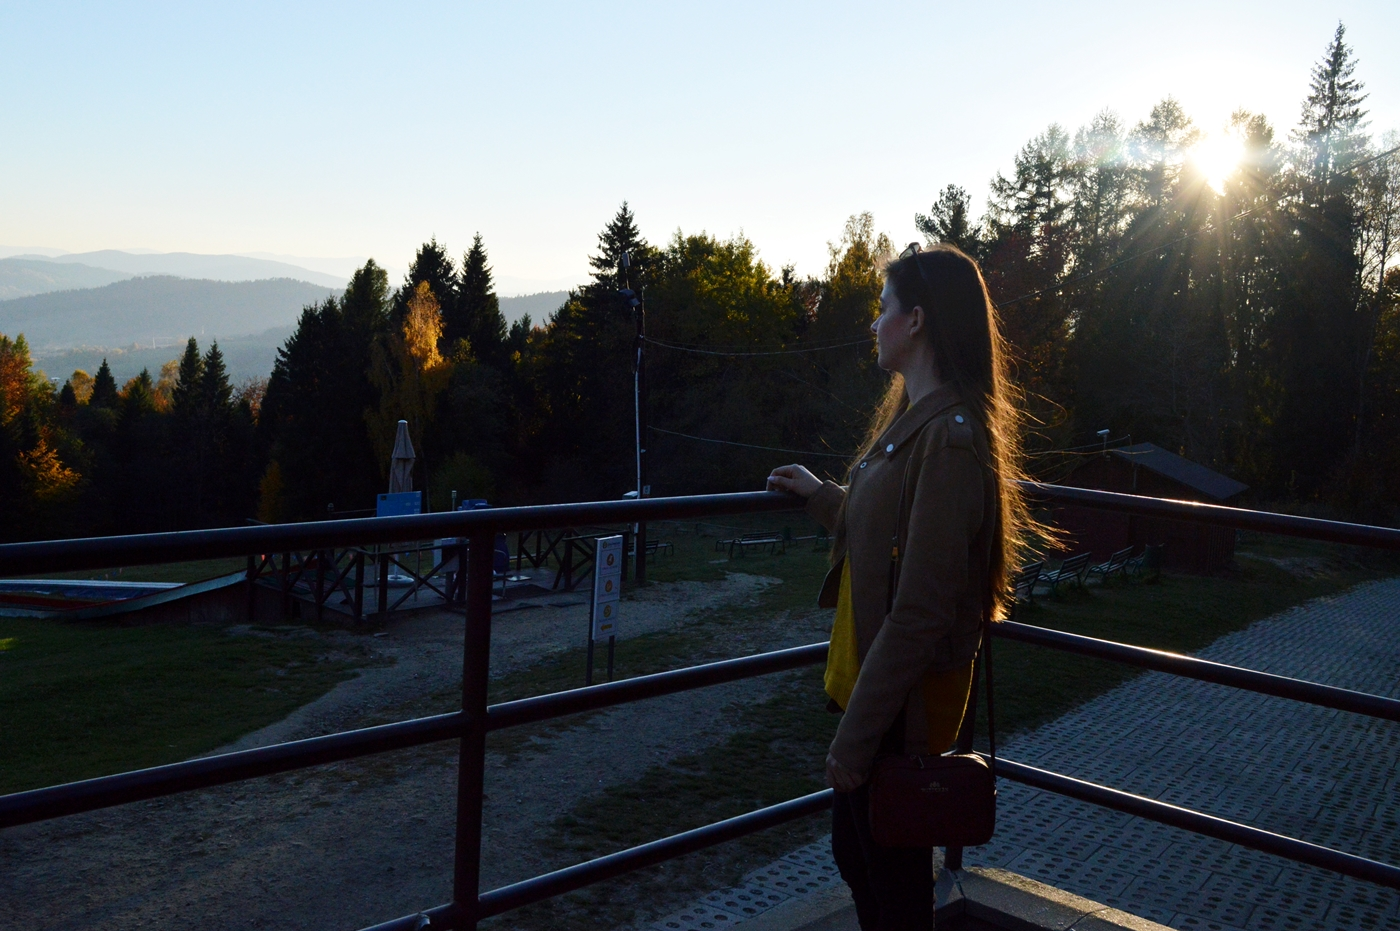 rozrywka lifestyle delishe blog